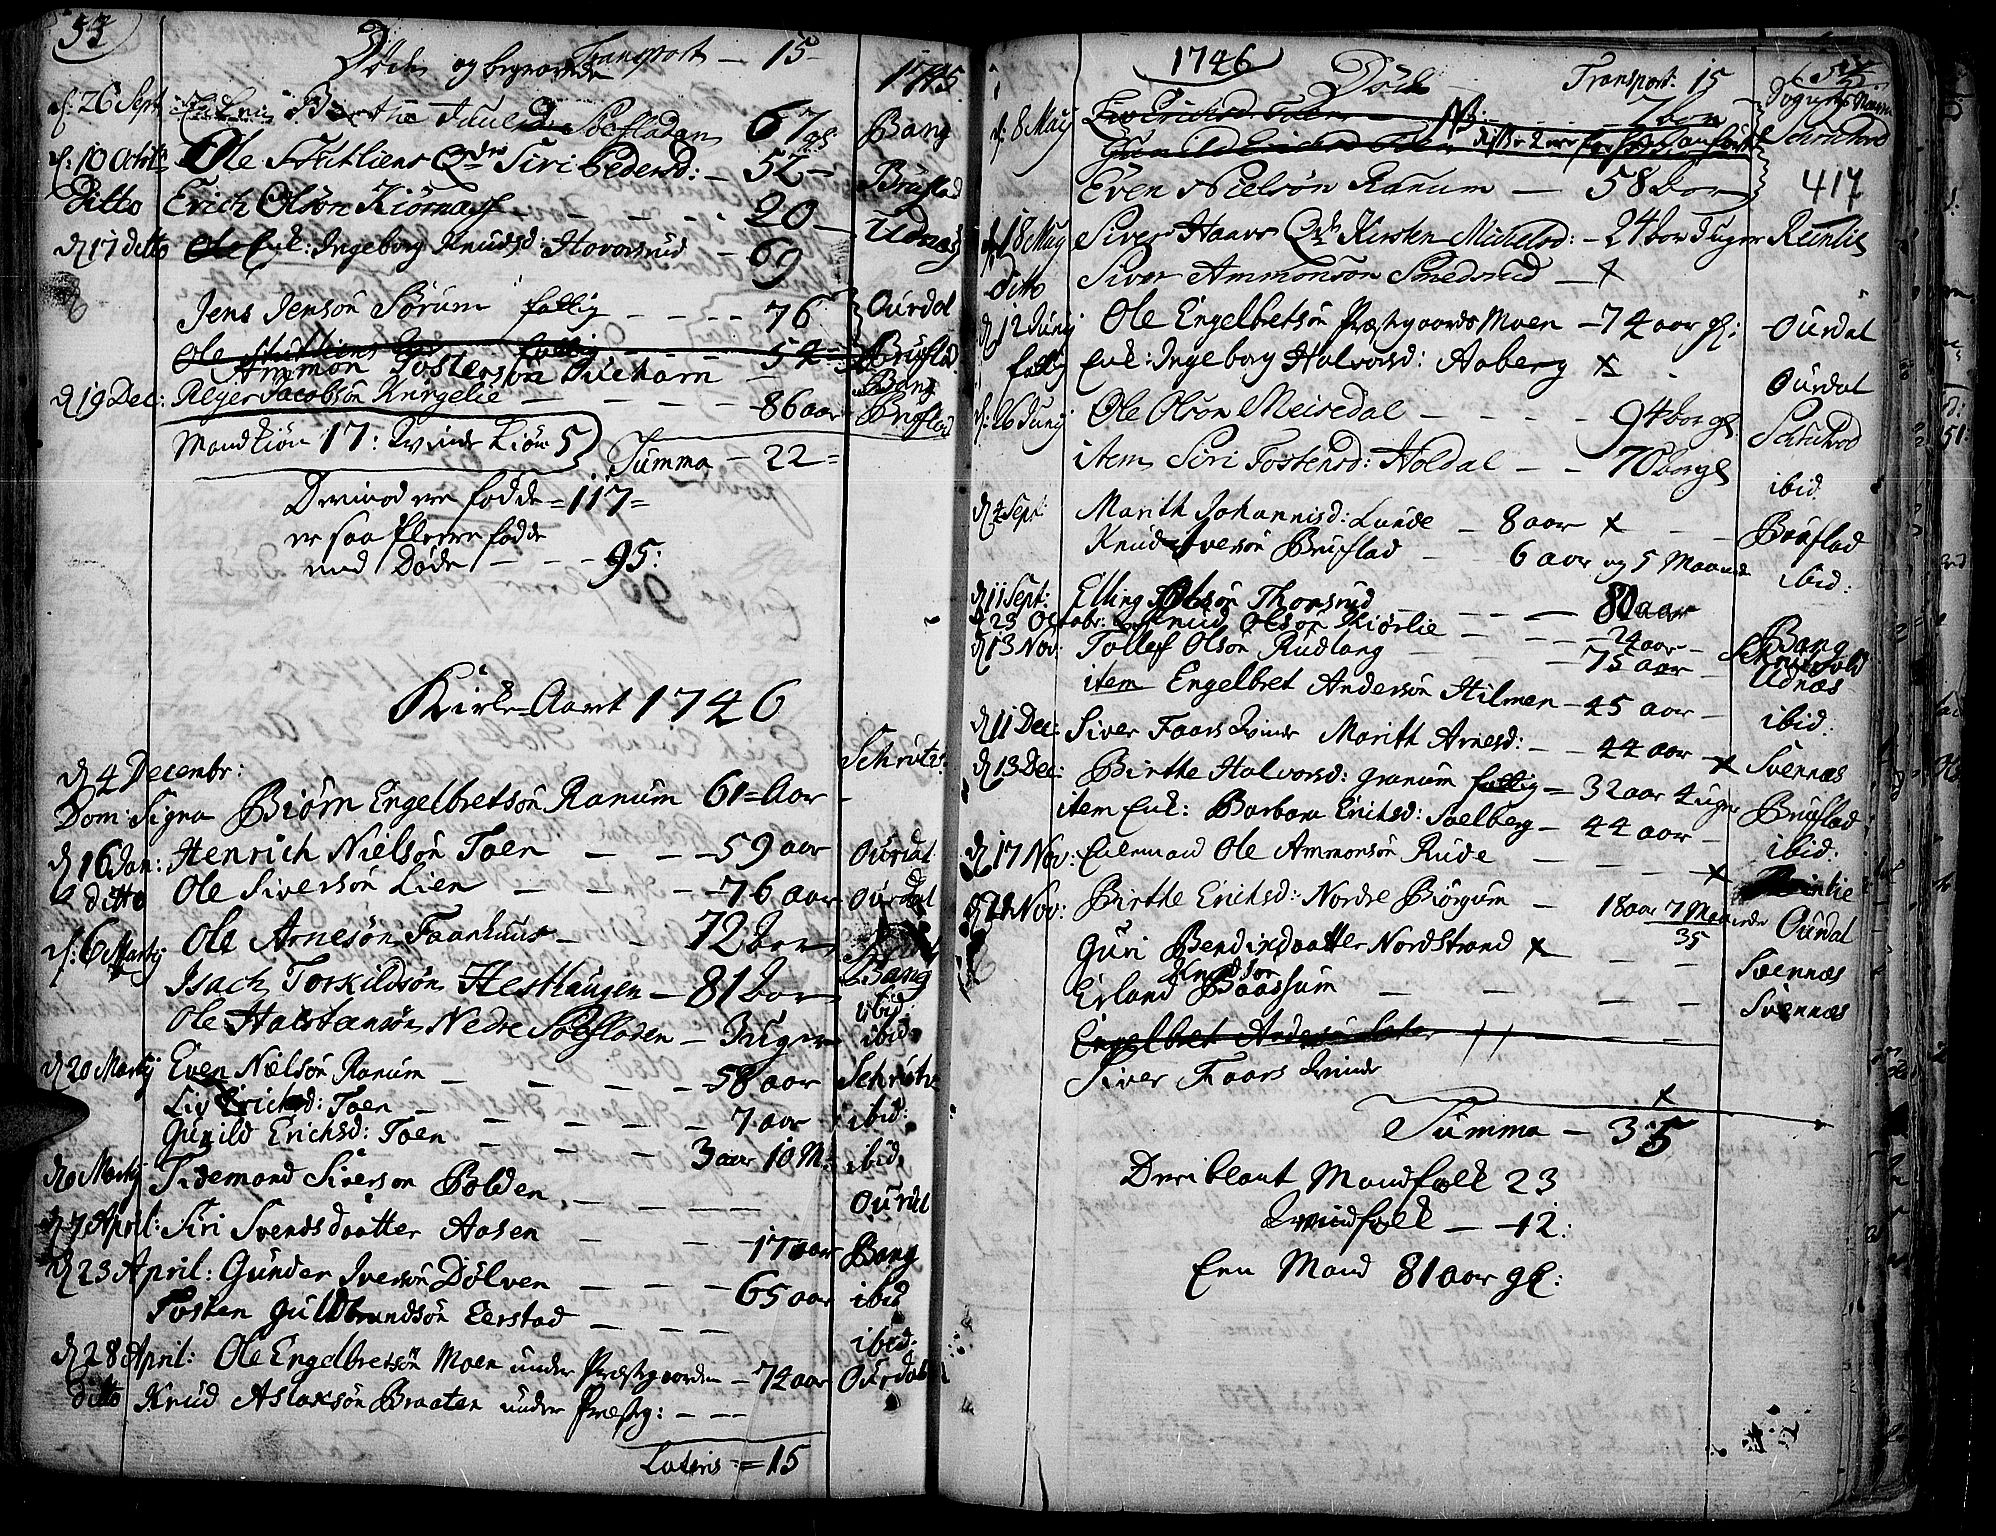 SAH, Aurdal prestekontor, Ministerialbok nr. 4, 1730-1762, s. 54-55